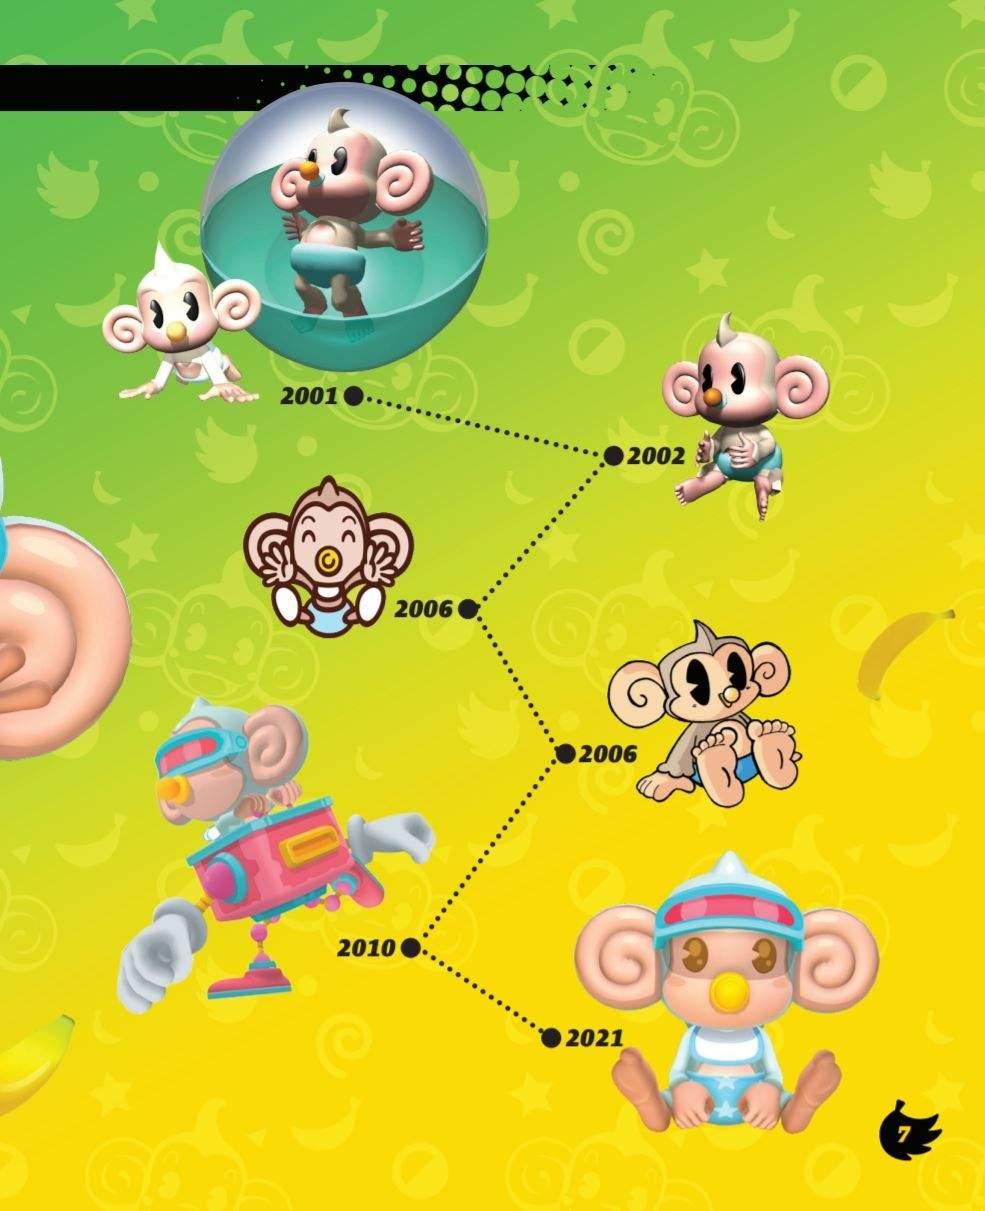 Baby Evolution Image